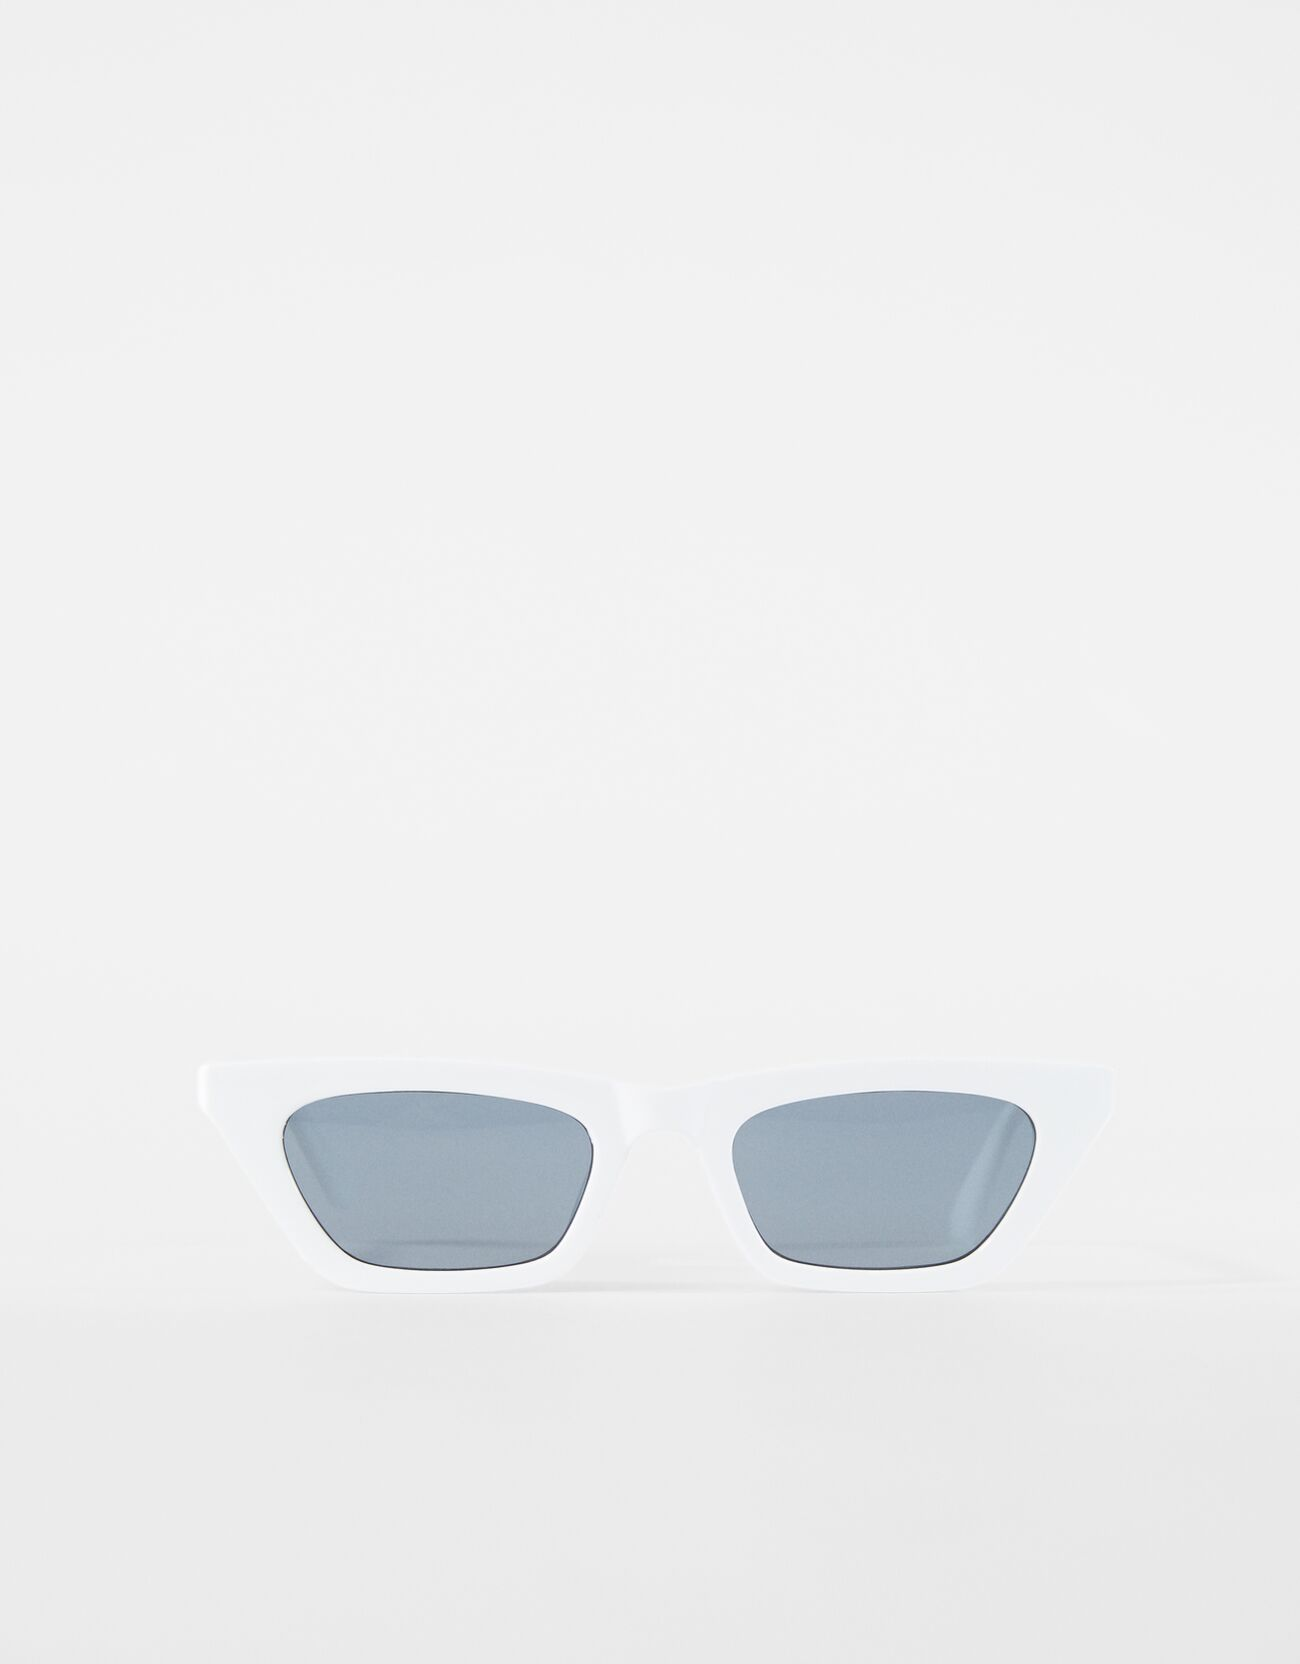 Gafas de sol cat eye.